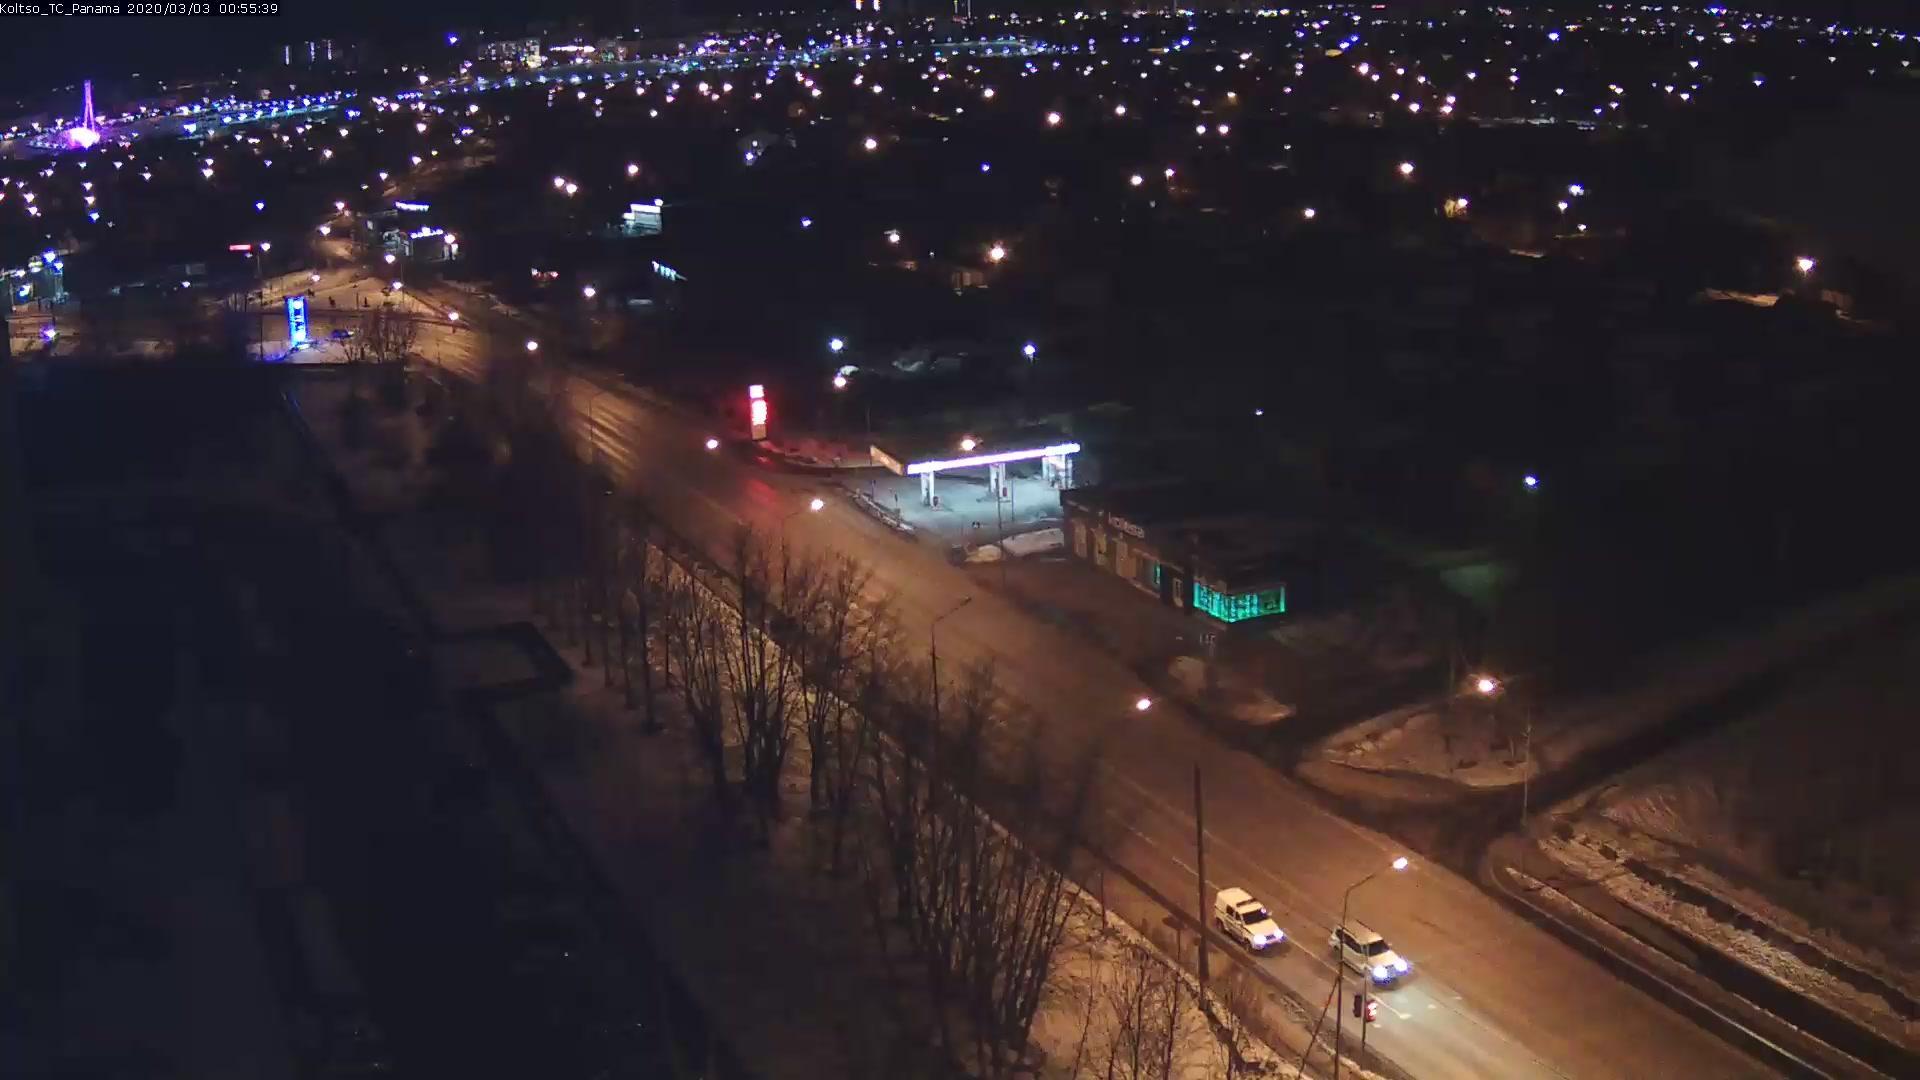 Webkamera Tyumen: ТЦ Панама